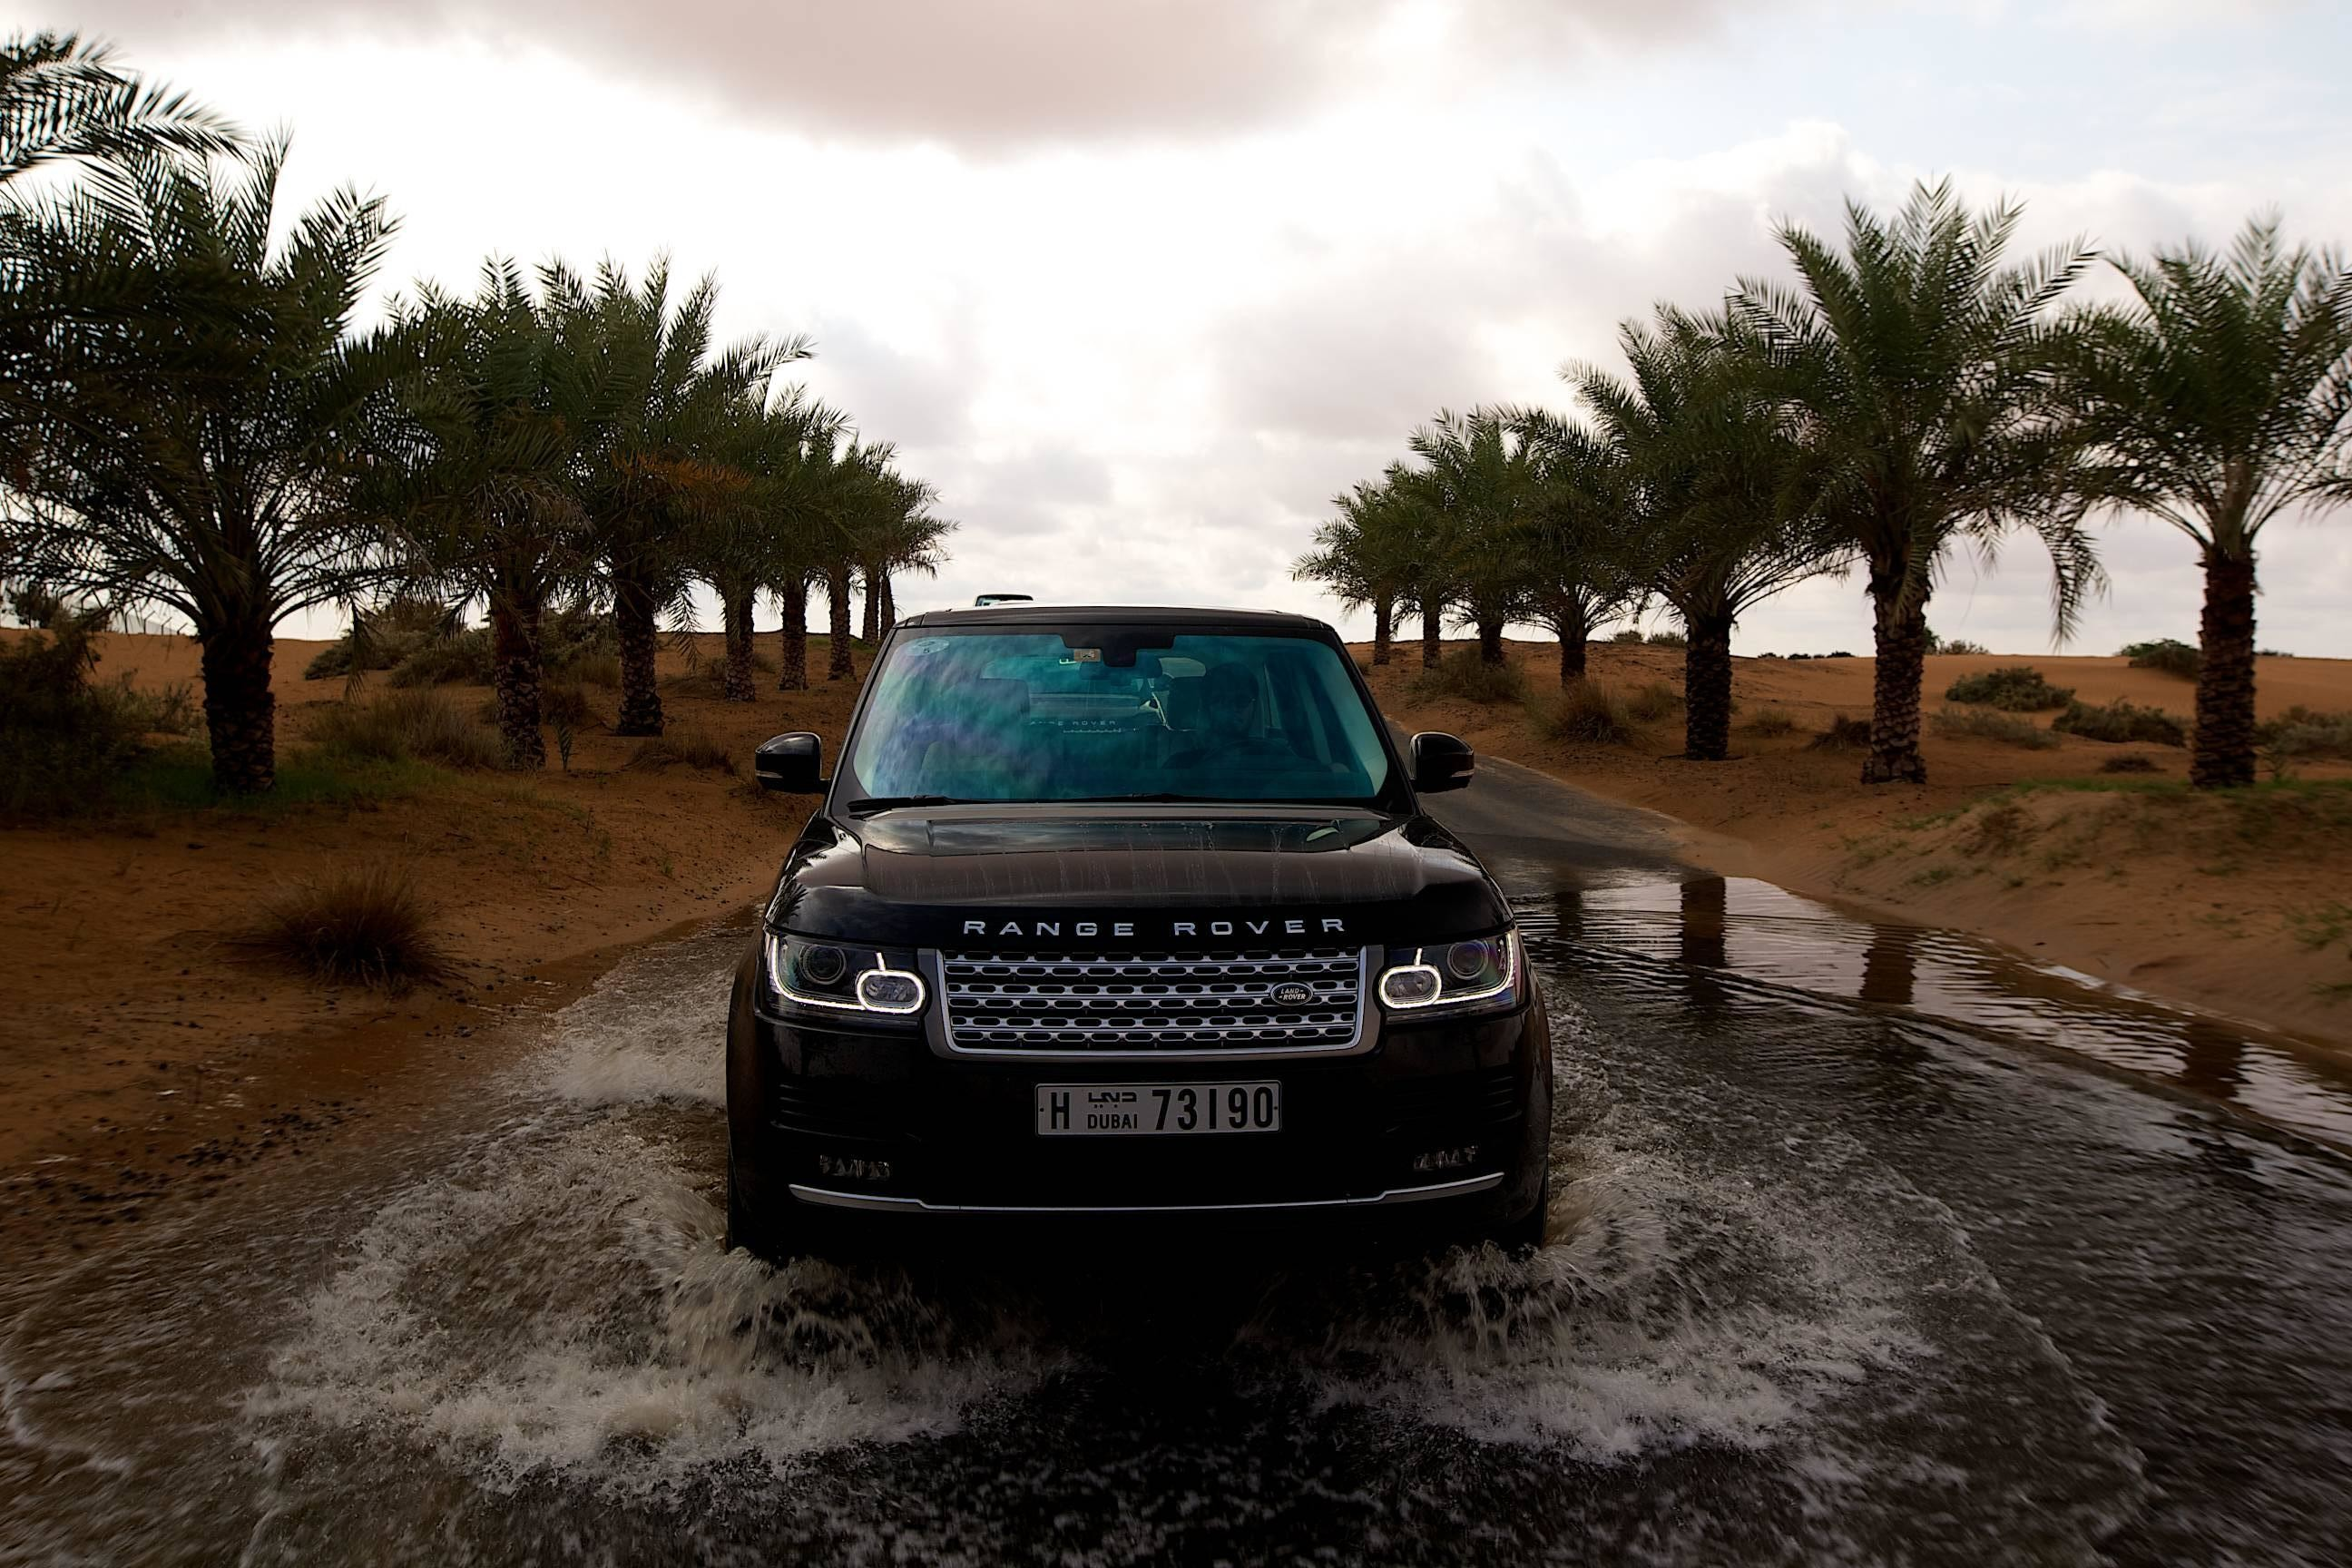 Range Rover Sport Iphone Wallpaper Top Upcoming Cars 2020